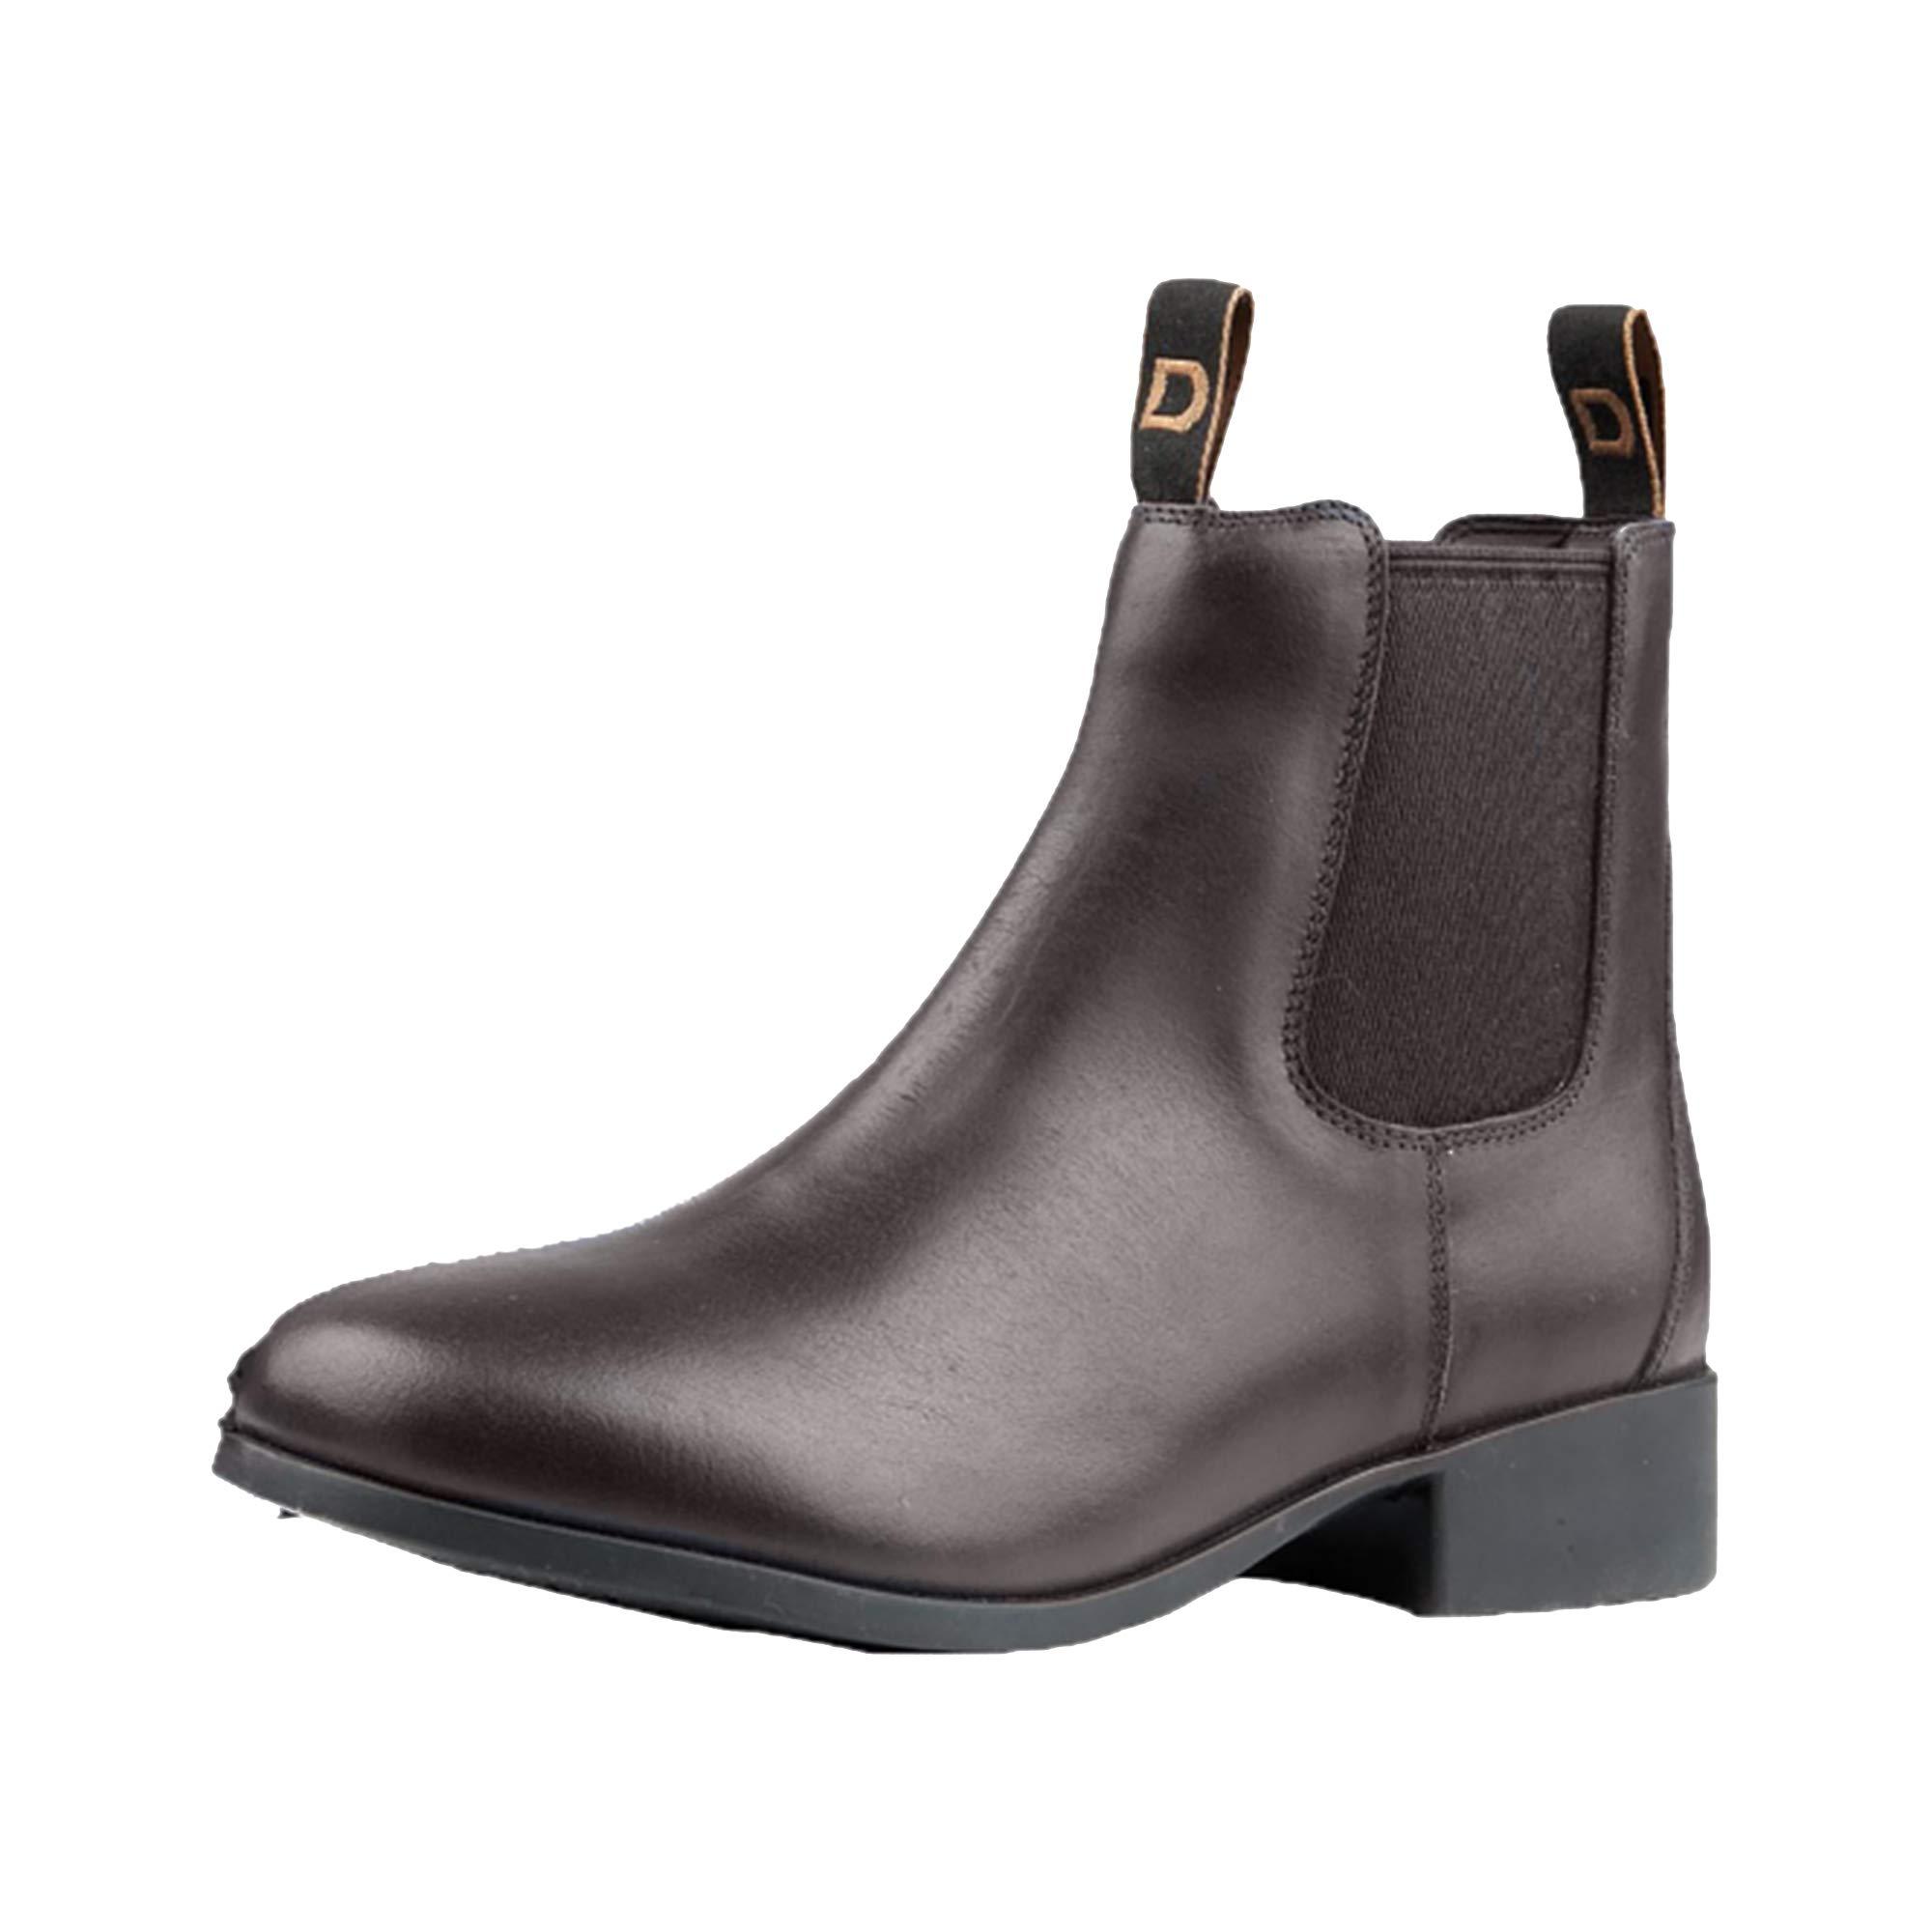 Dublin Childrens/Kids Leather Foundation Jodhpur Boots (3 M US Little Kid) (Brown)